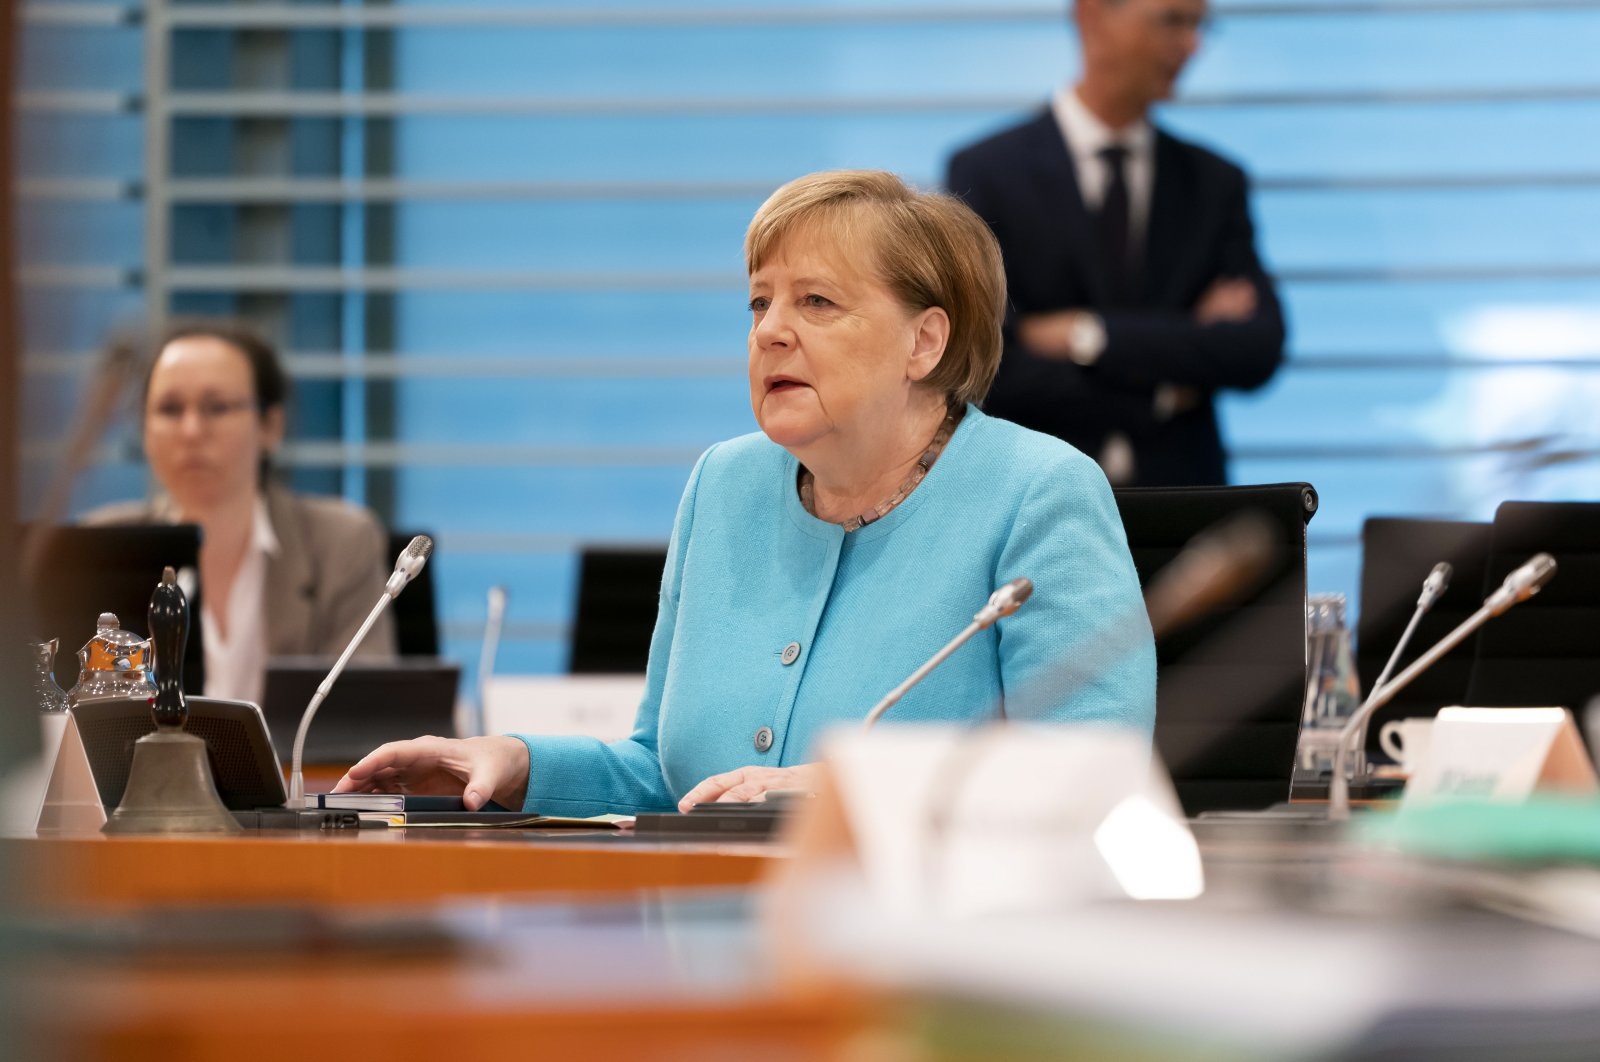 German Chancellor Angela Merkel attends the weekly meeting of the German Federal Cabinet, Berlin, June 3, 2020. (EPA Photo)